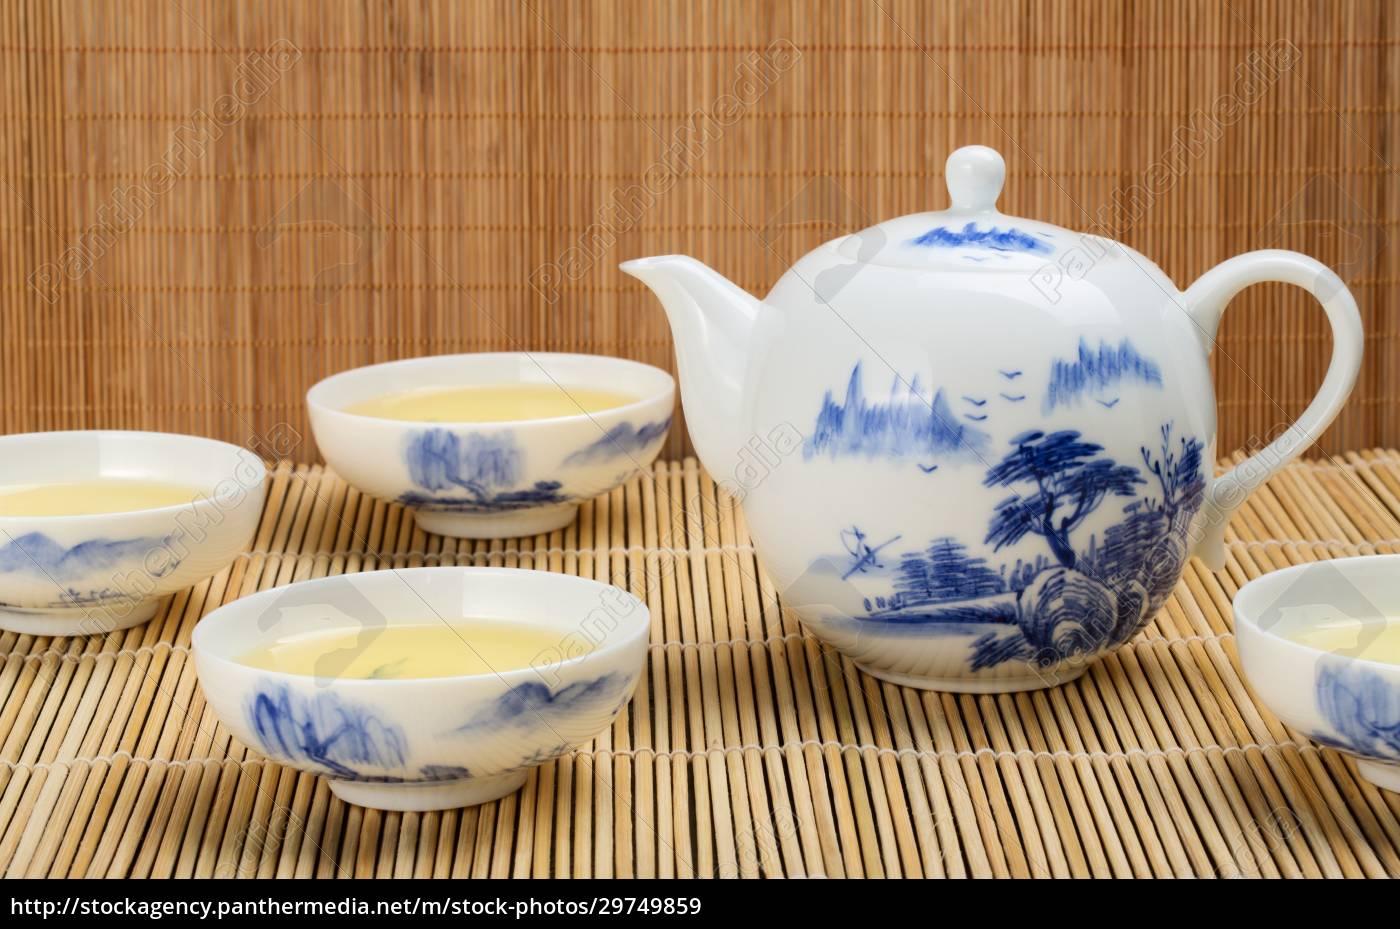 china's, tea, culture - 29749859